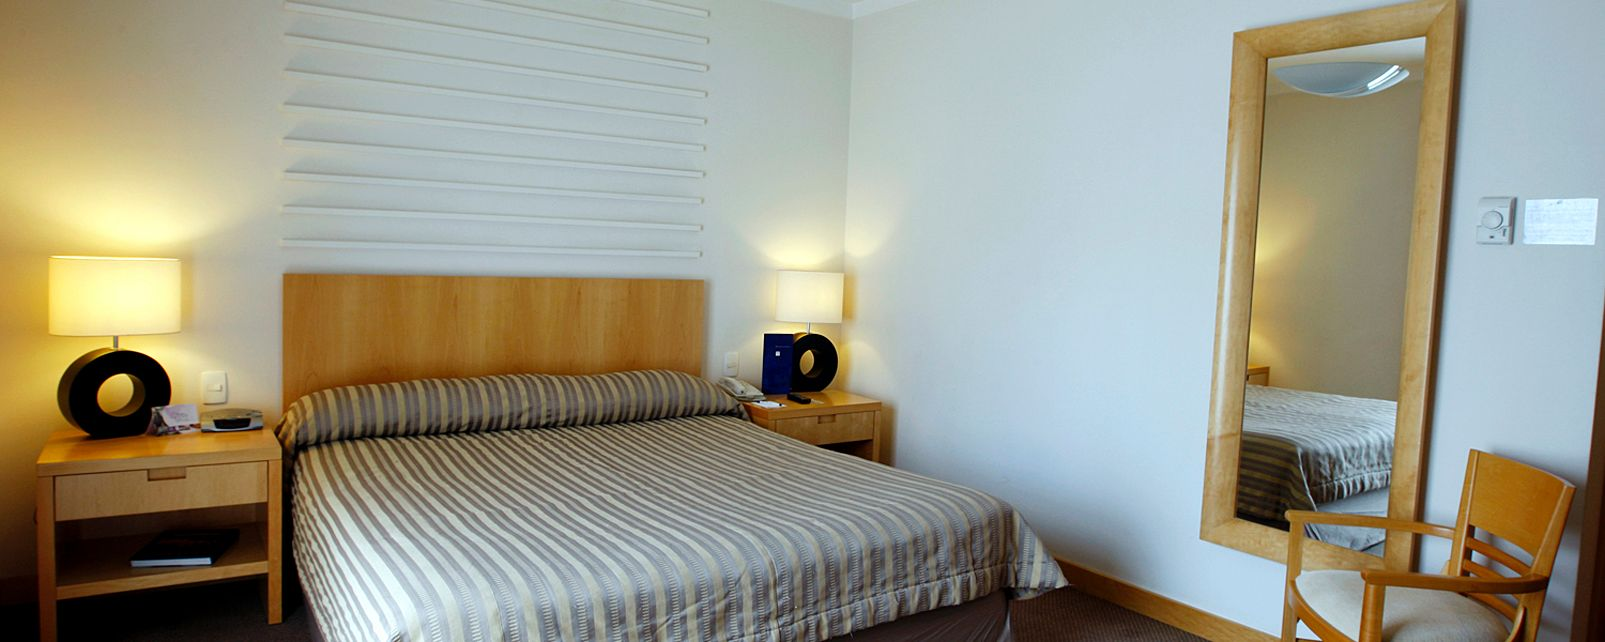 Hotel Tryp Paulista